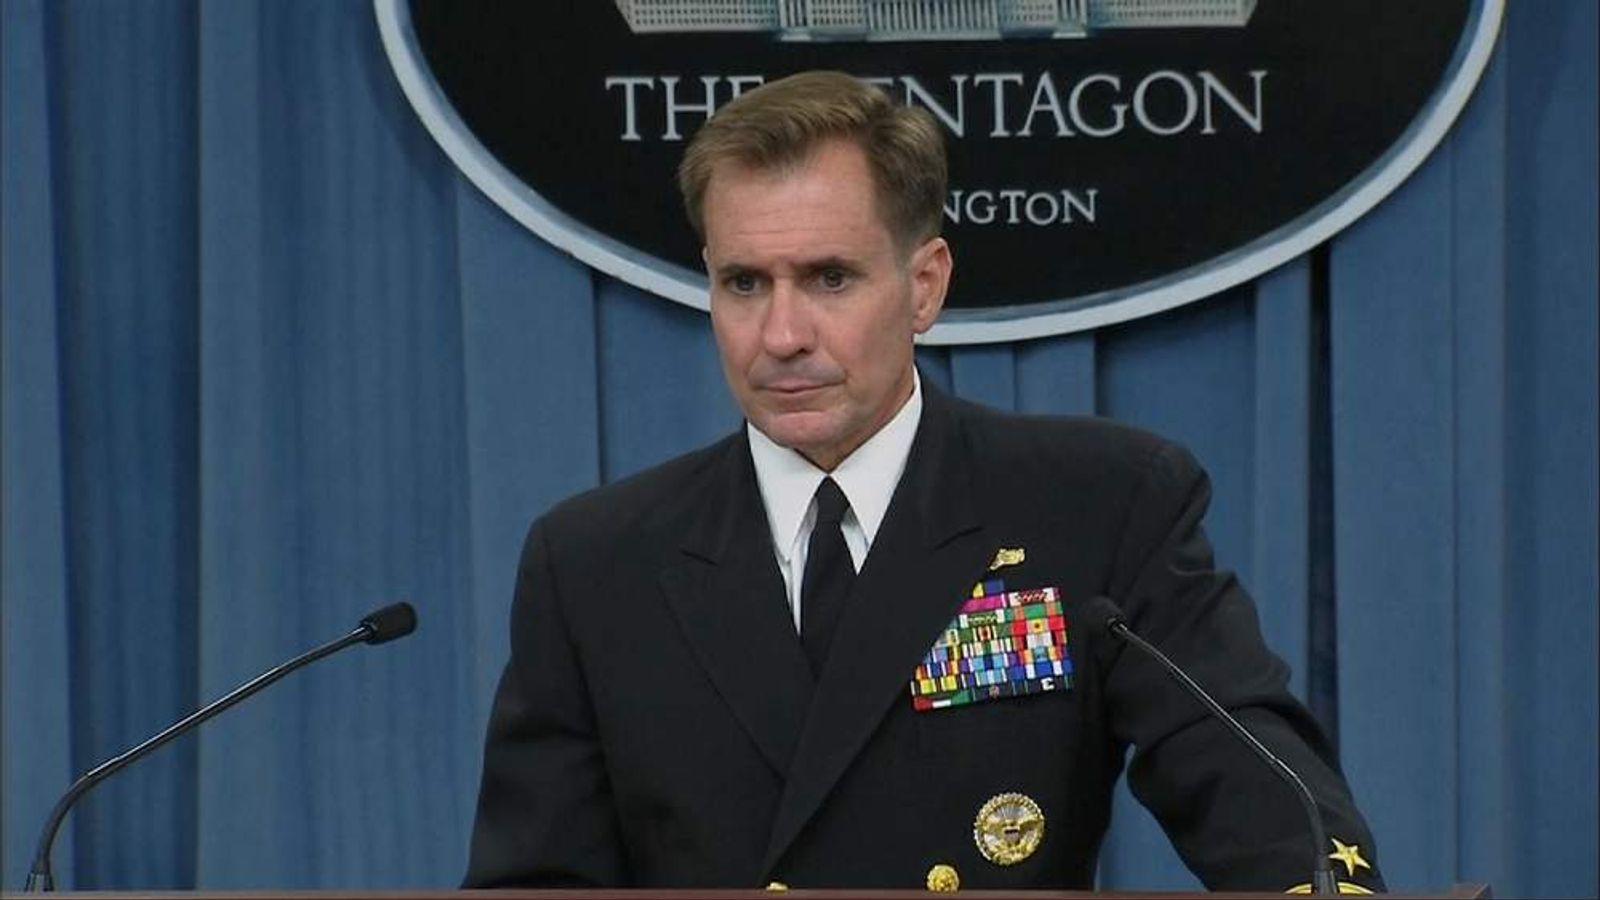 Pentagon Press Secretary Rear Admiral John Kirby